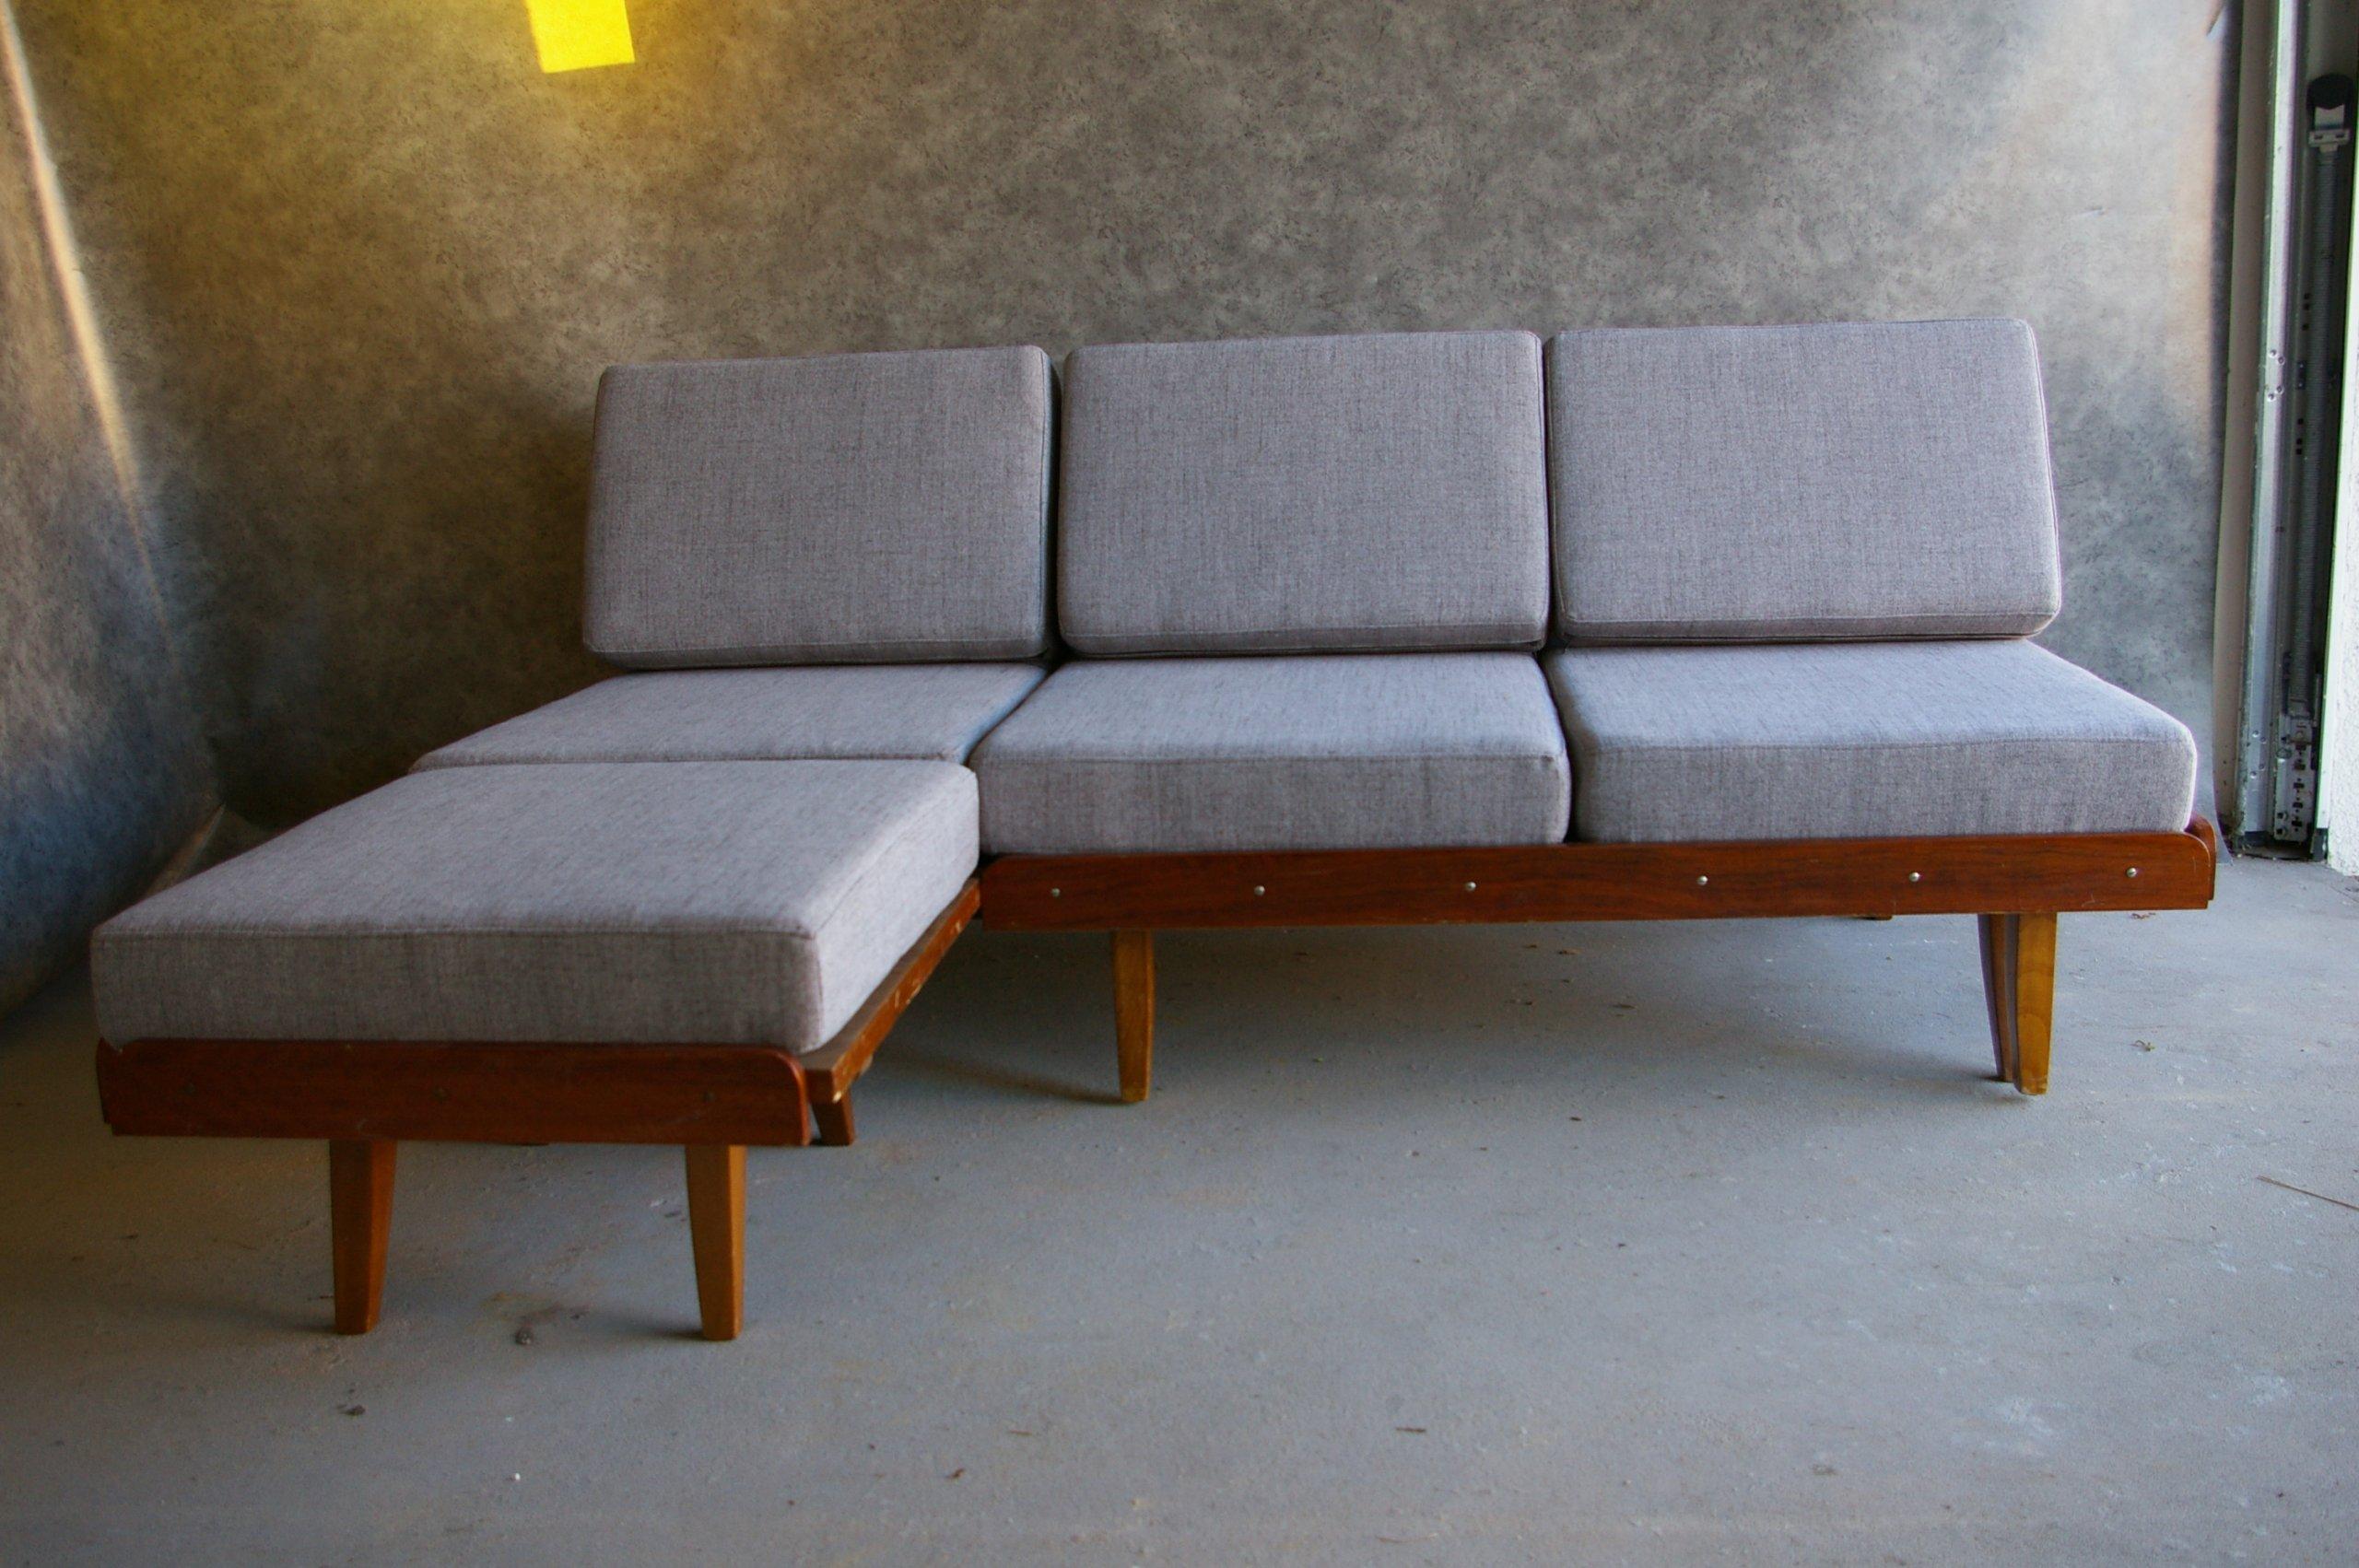 Sofa Prl Loft Vintage Retro Wersalka Kanapa 6690877645